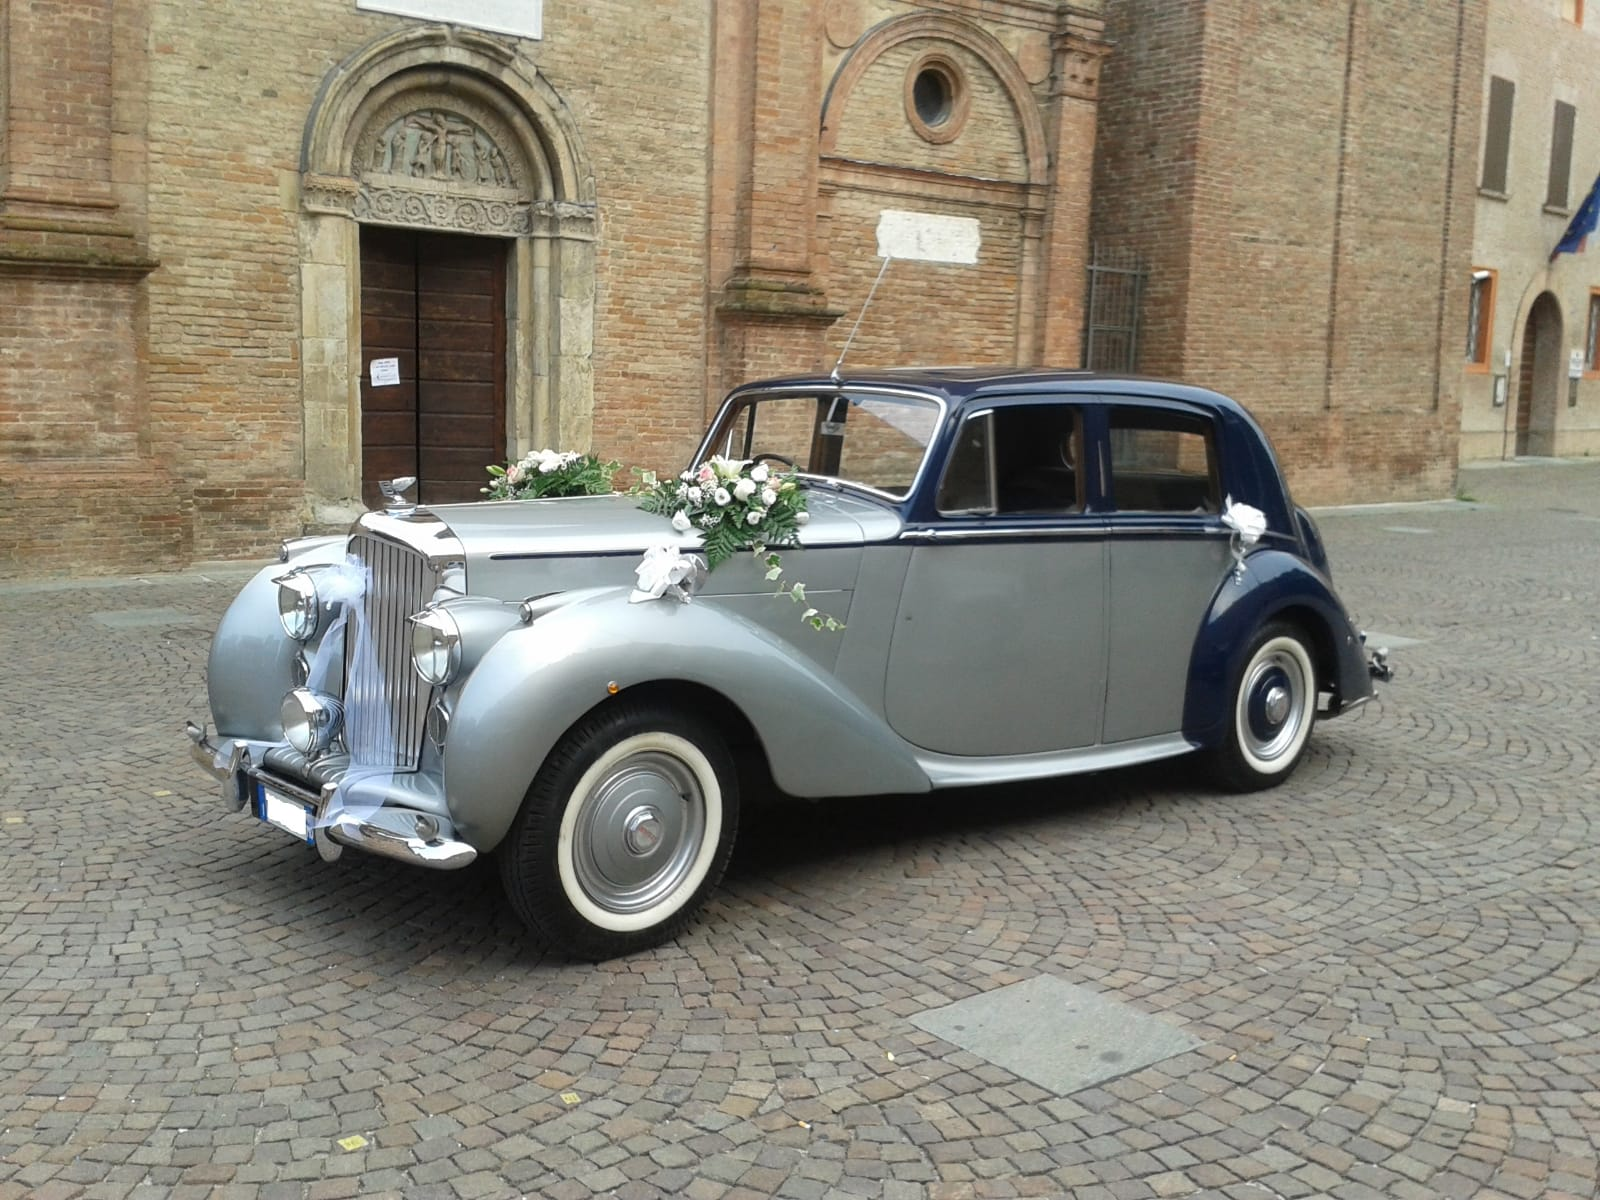 Noleggio auto matrimoni - Luxury Top Car Bentley MK6 - noleggio auto storiche